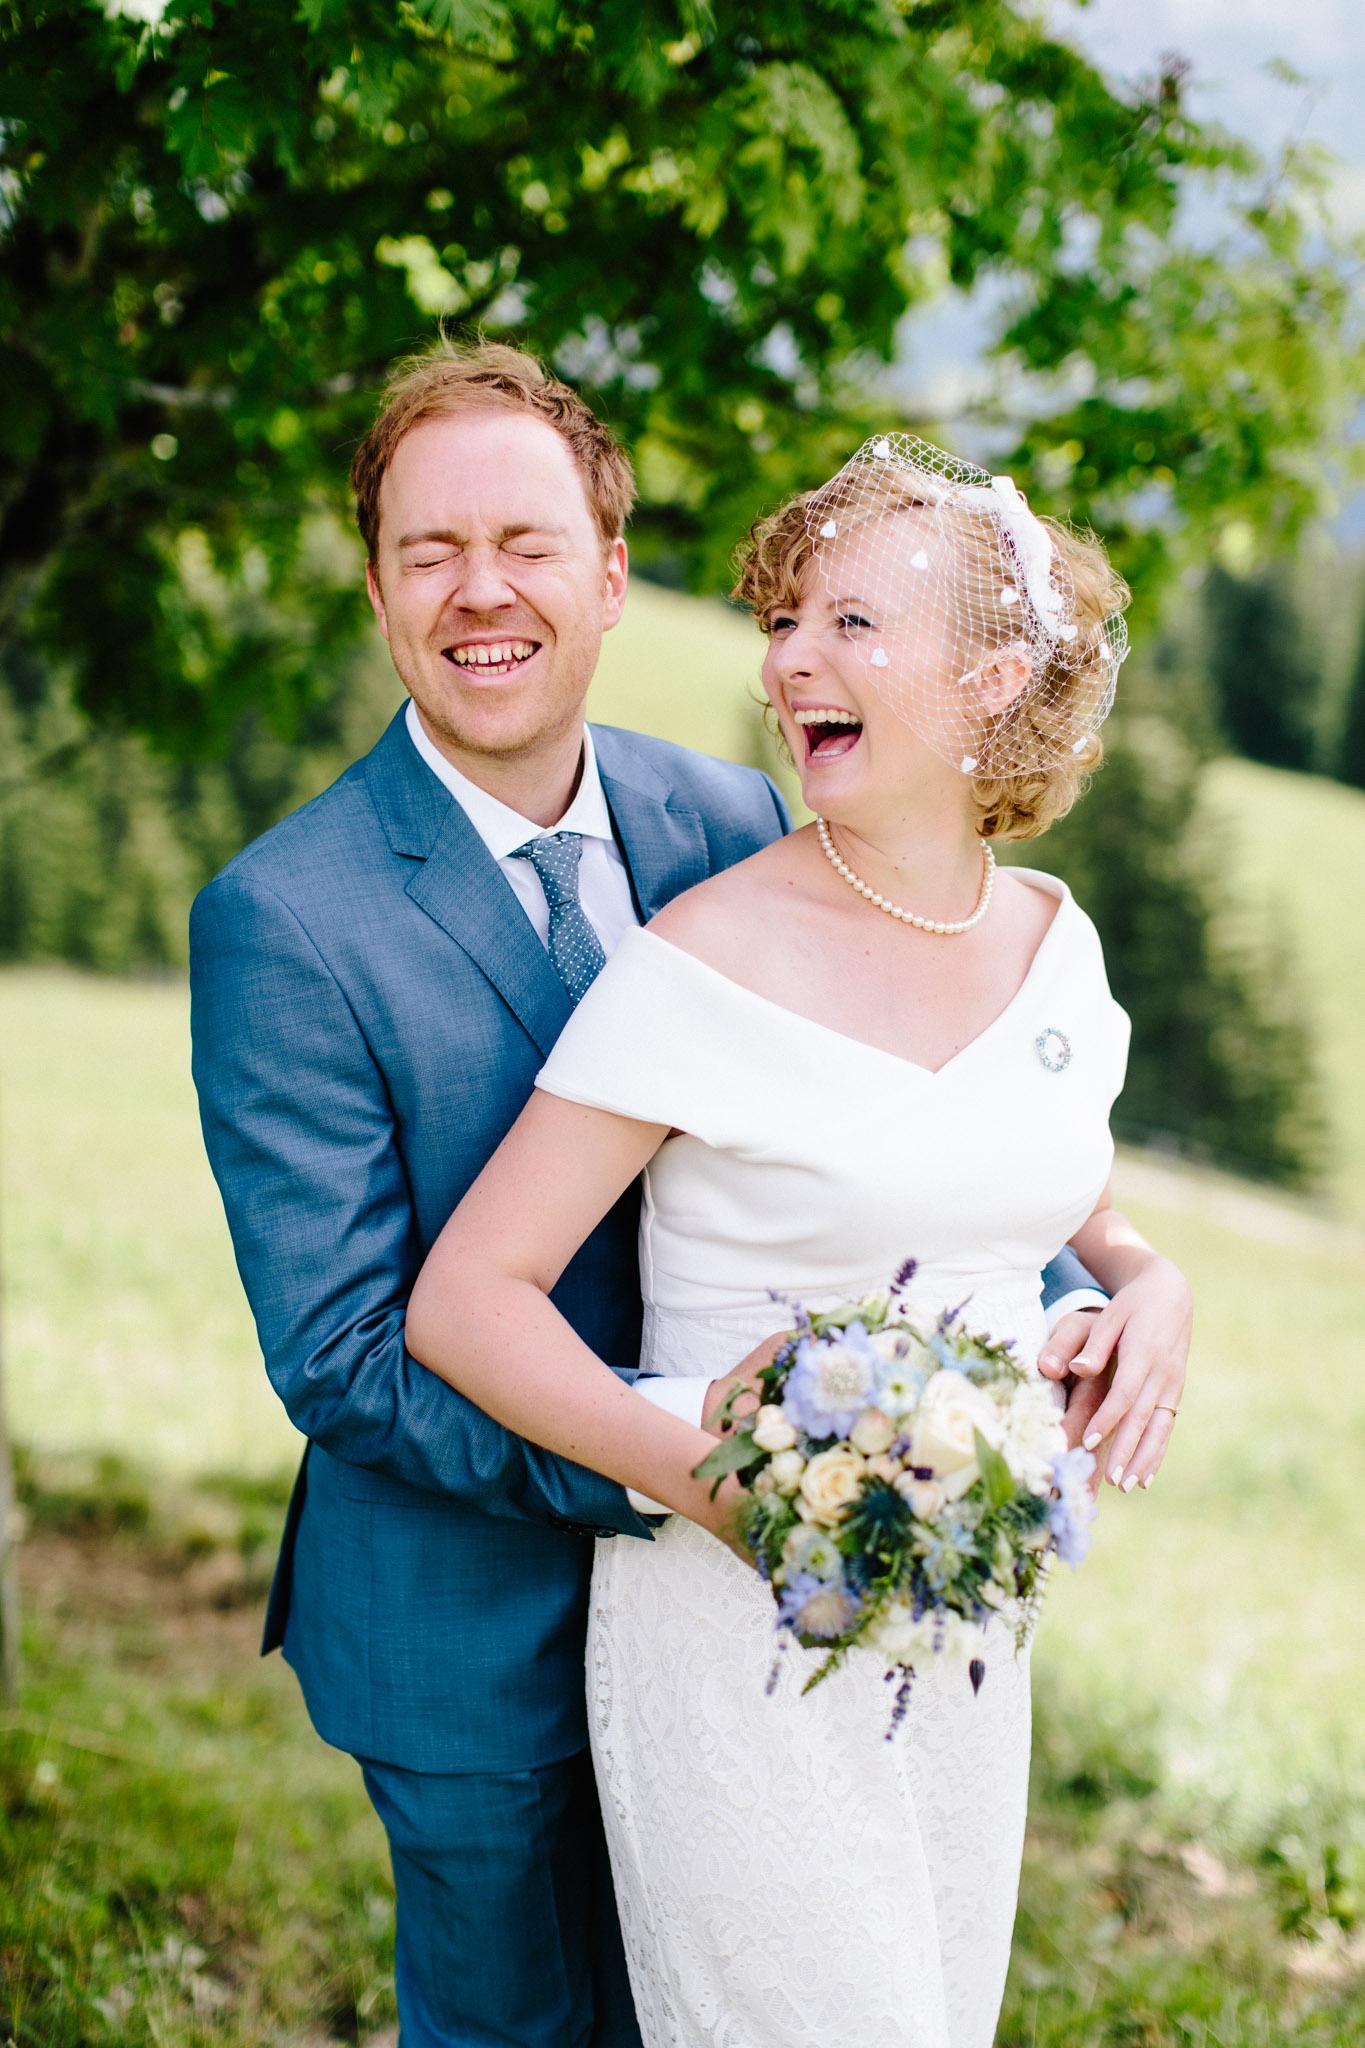 Lenl-Simmental-Buehlerhof-Pia-Anna-Christian-Wedding-Photography-EK-33.jpg